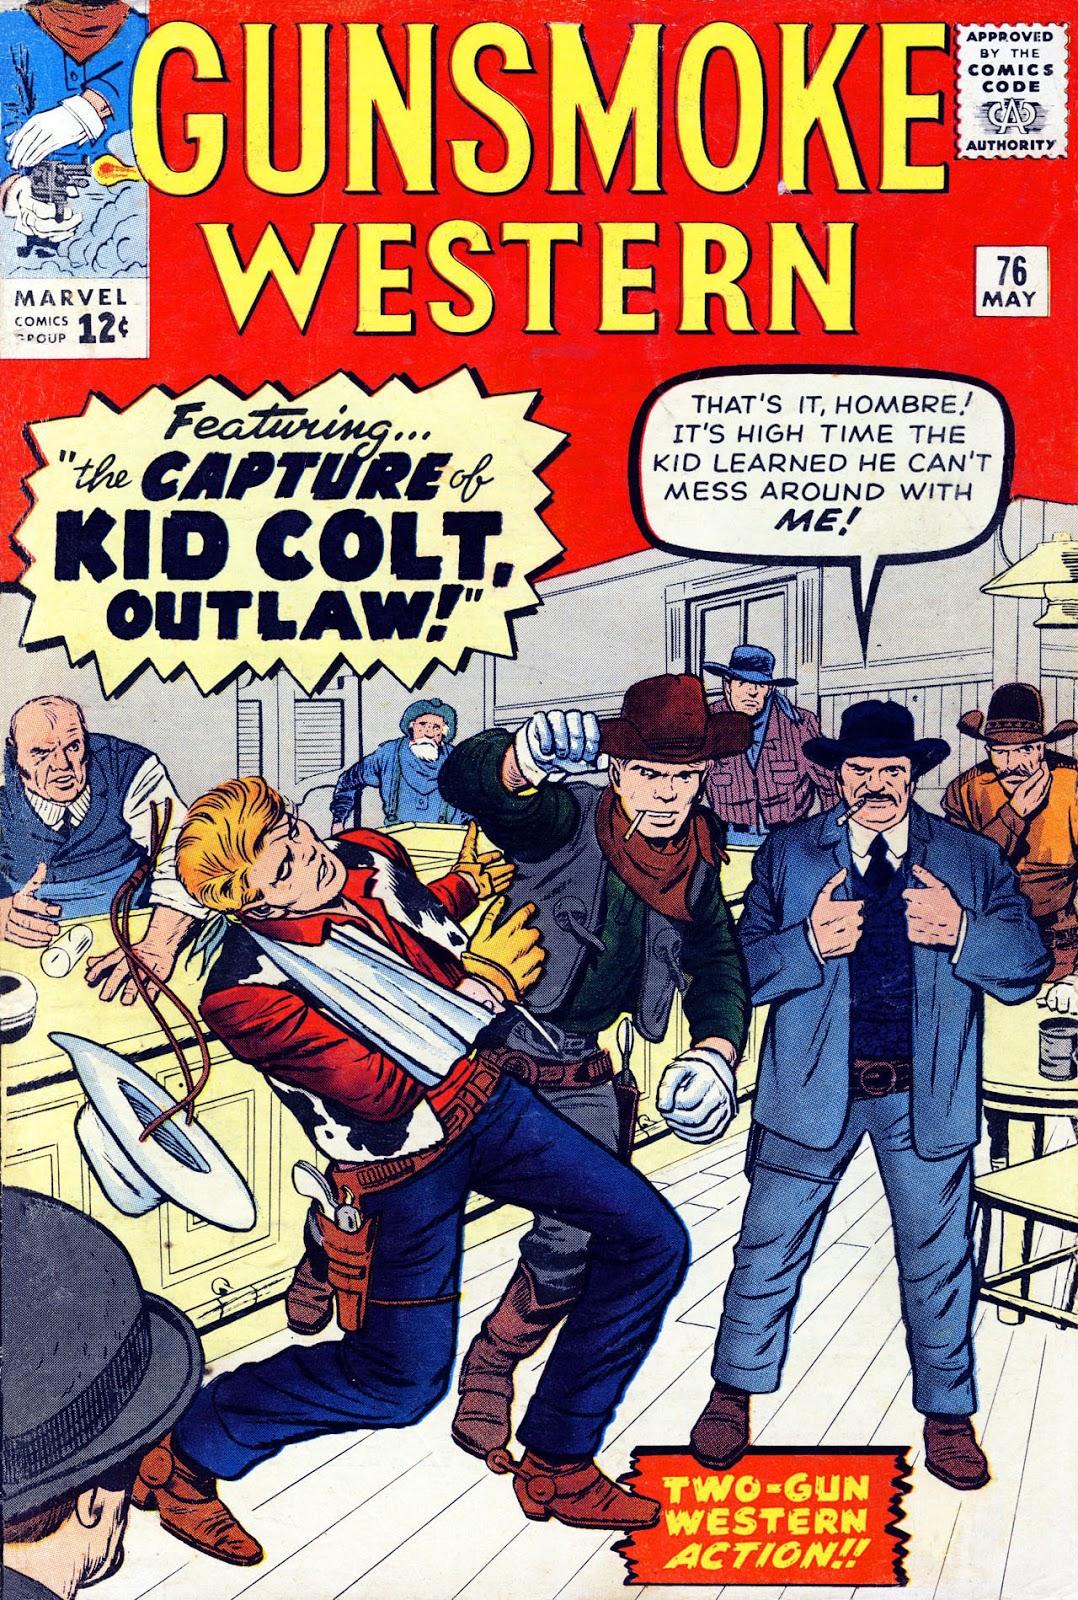 Gunsmoke Western issue 76 - Page 1